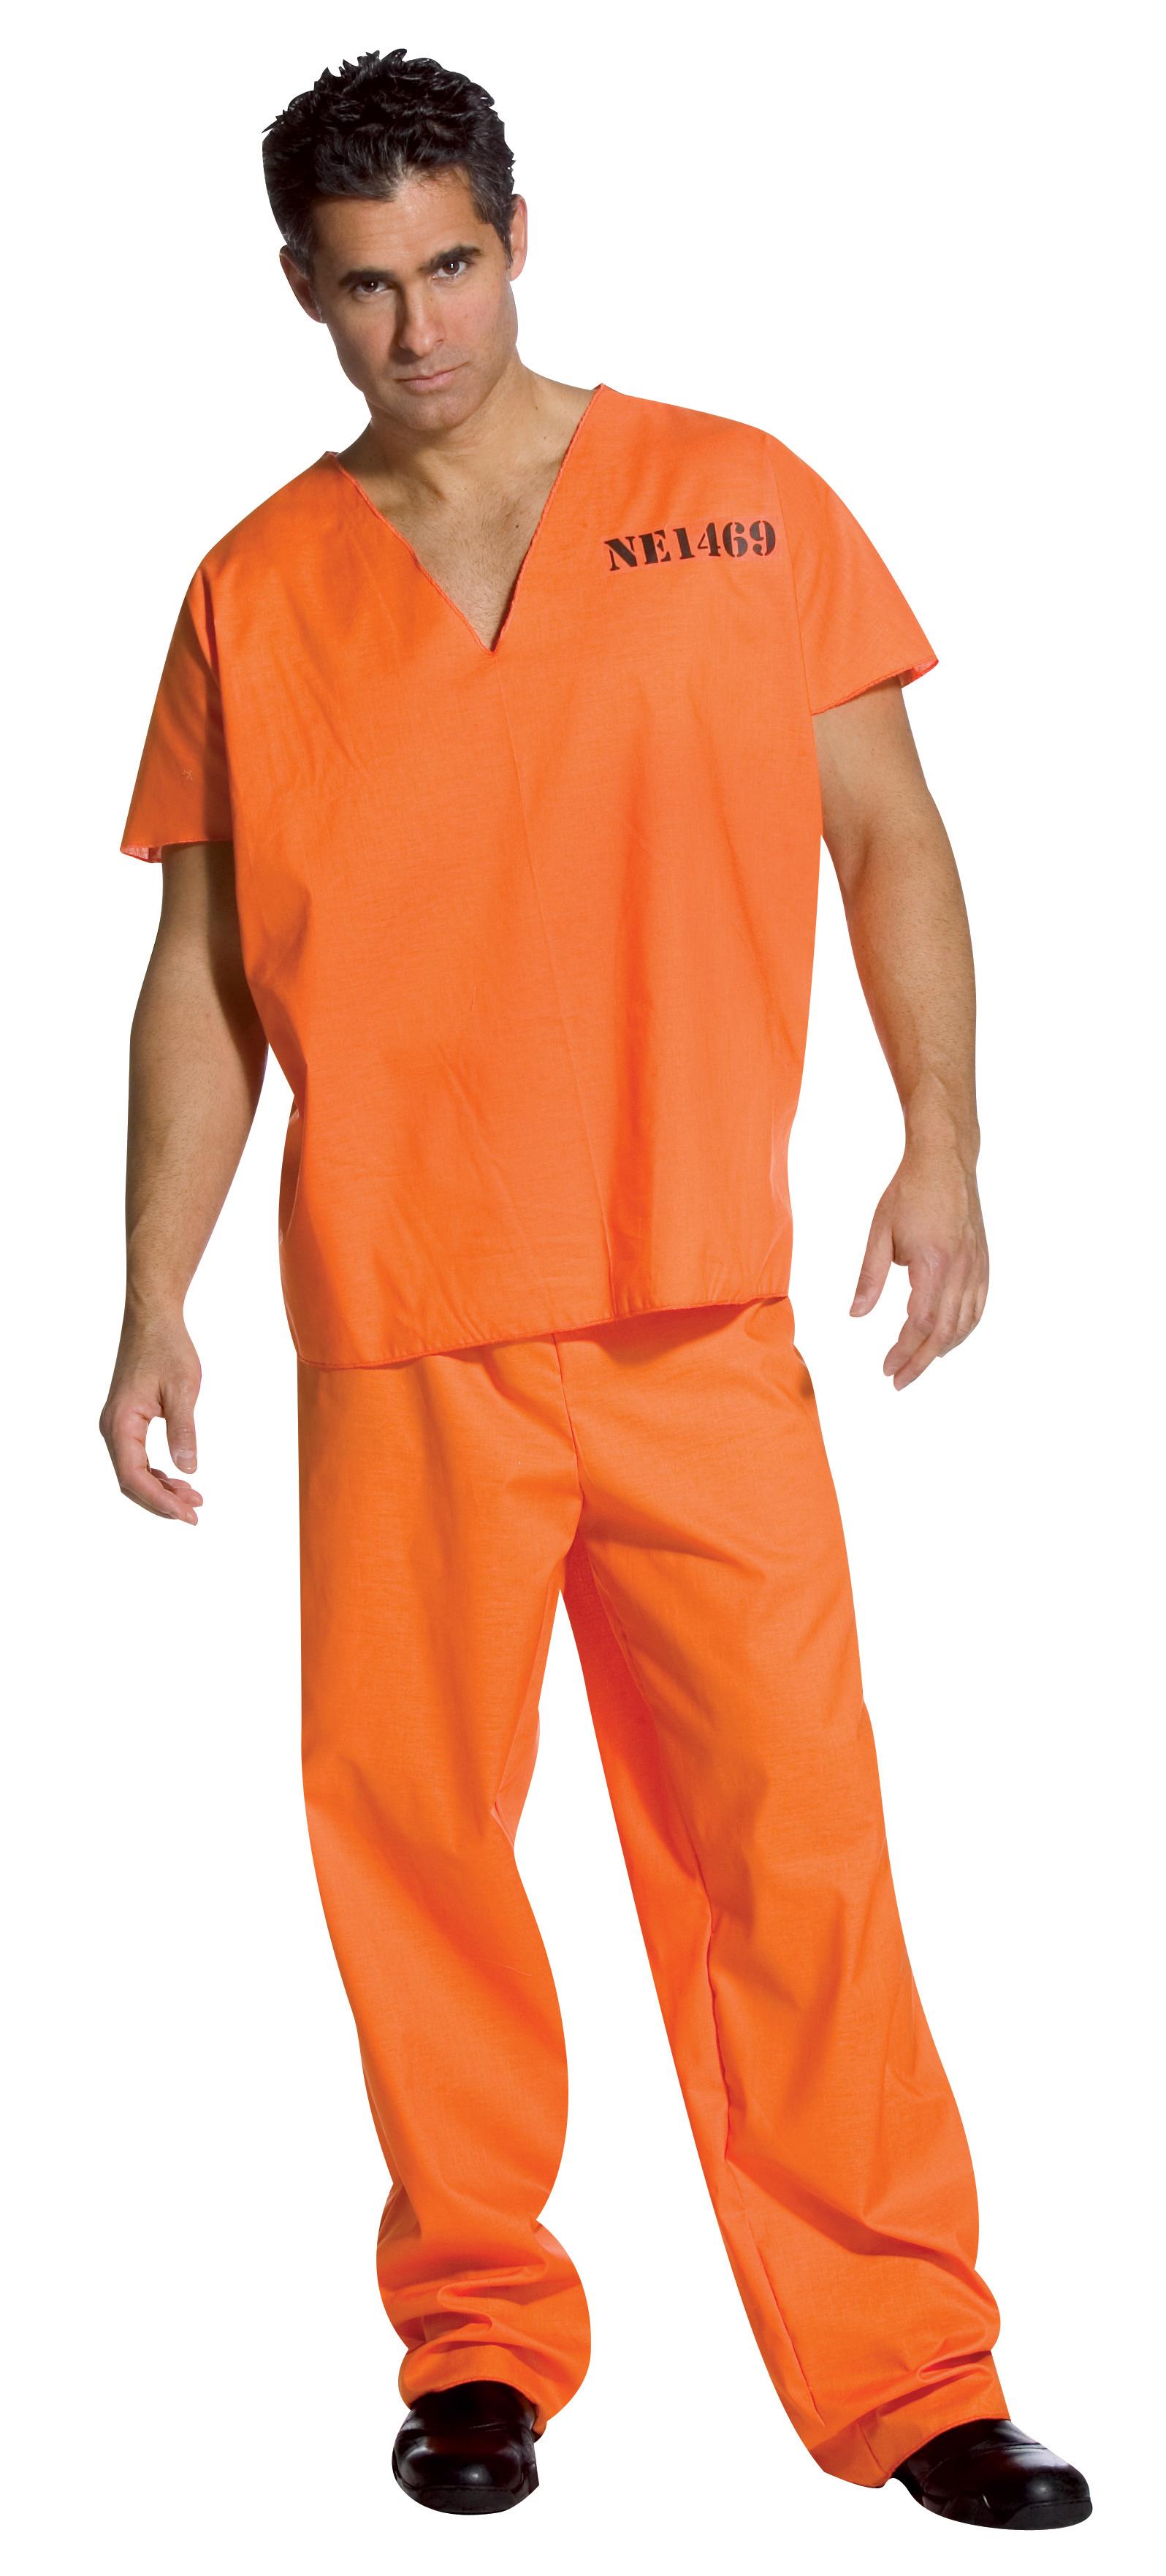 Orange Jail Jumpsuit Meaning